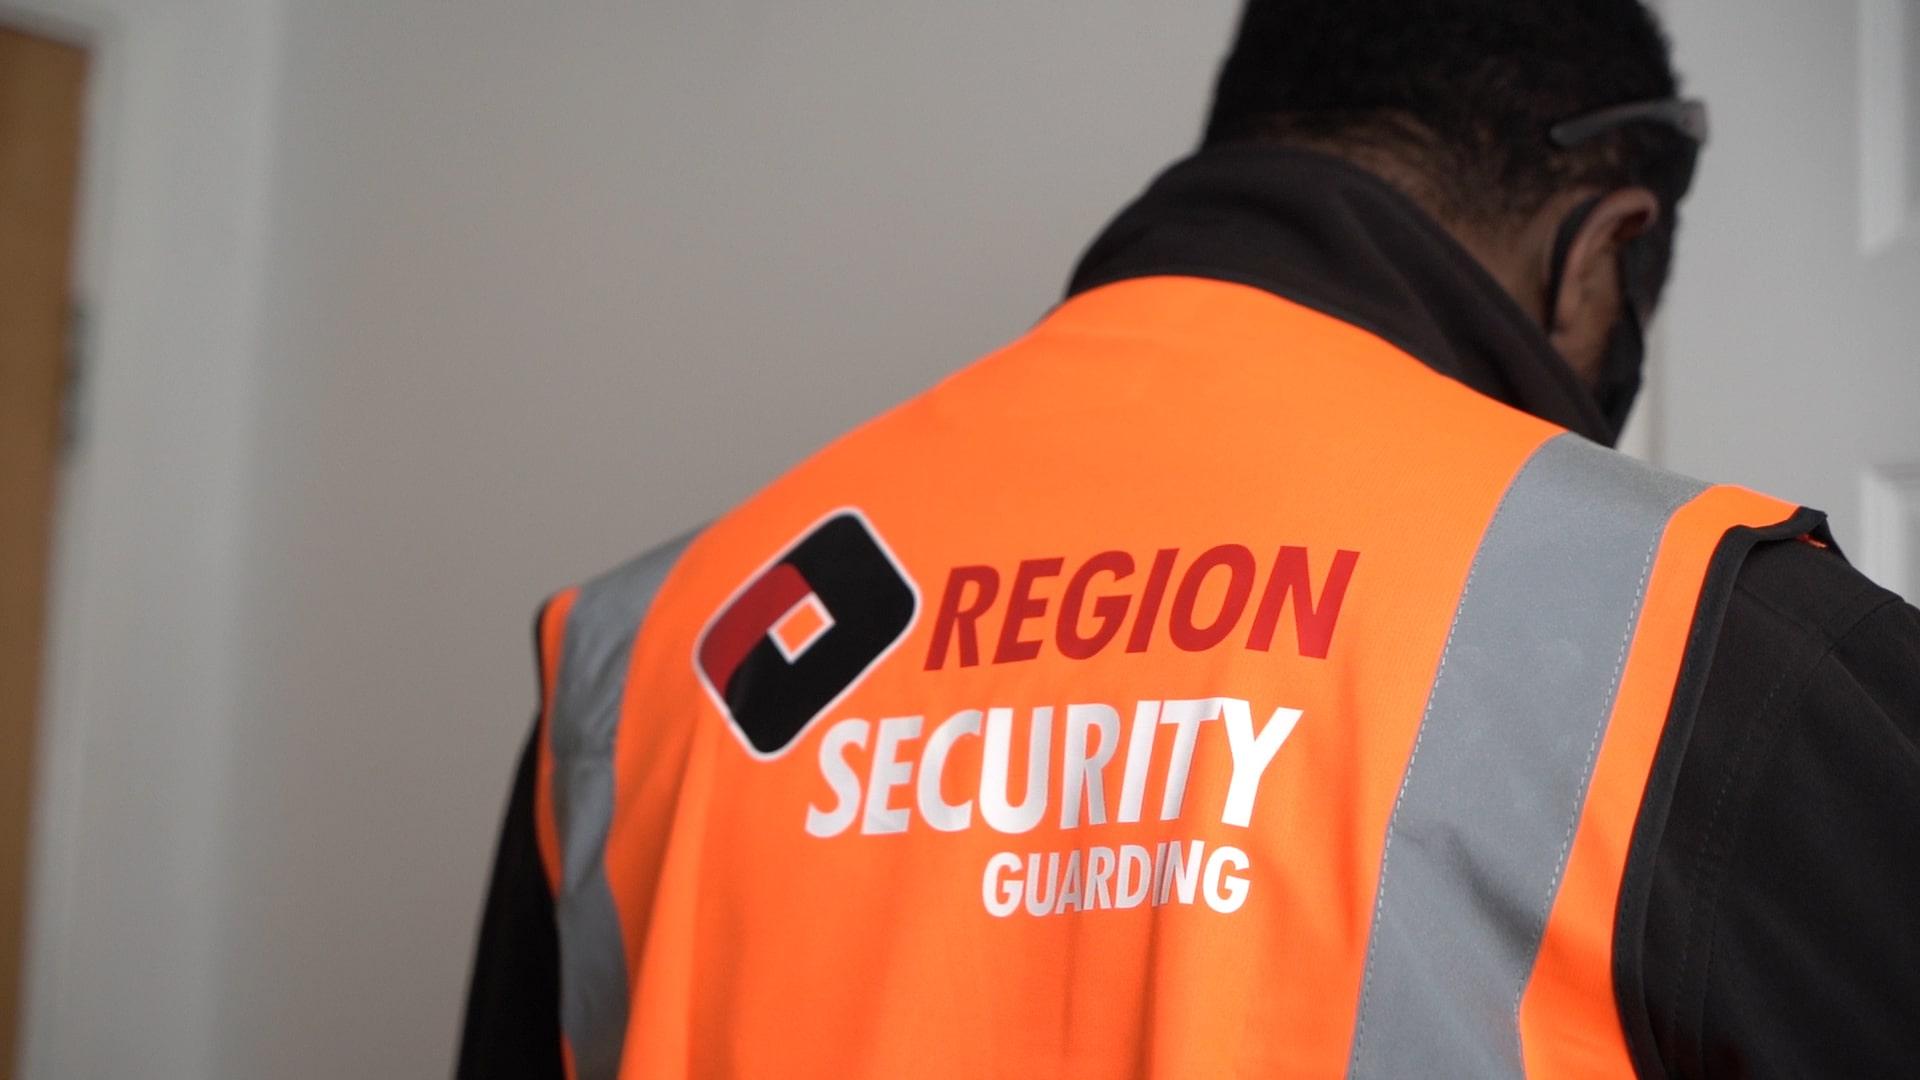 Region Security Company Halifax